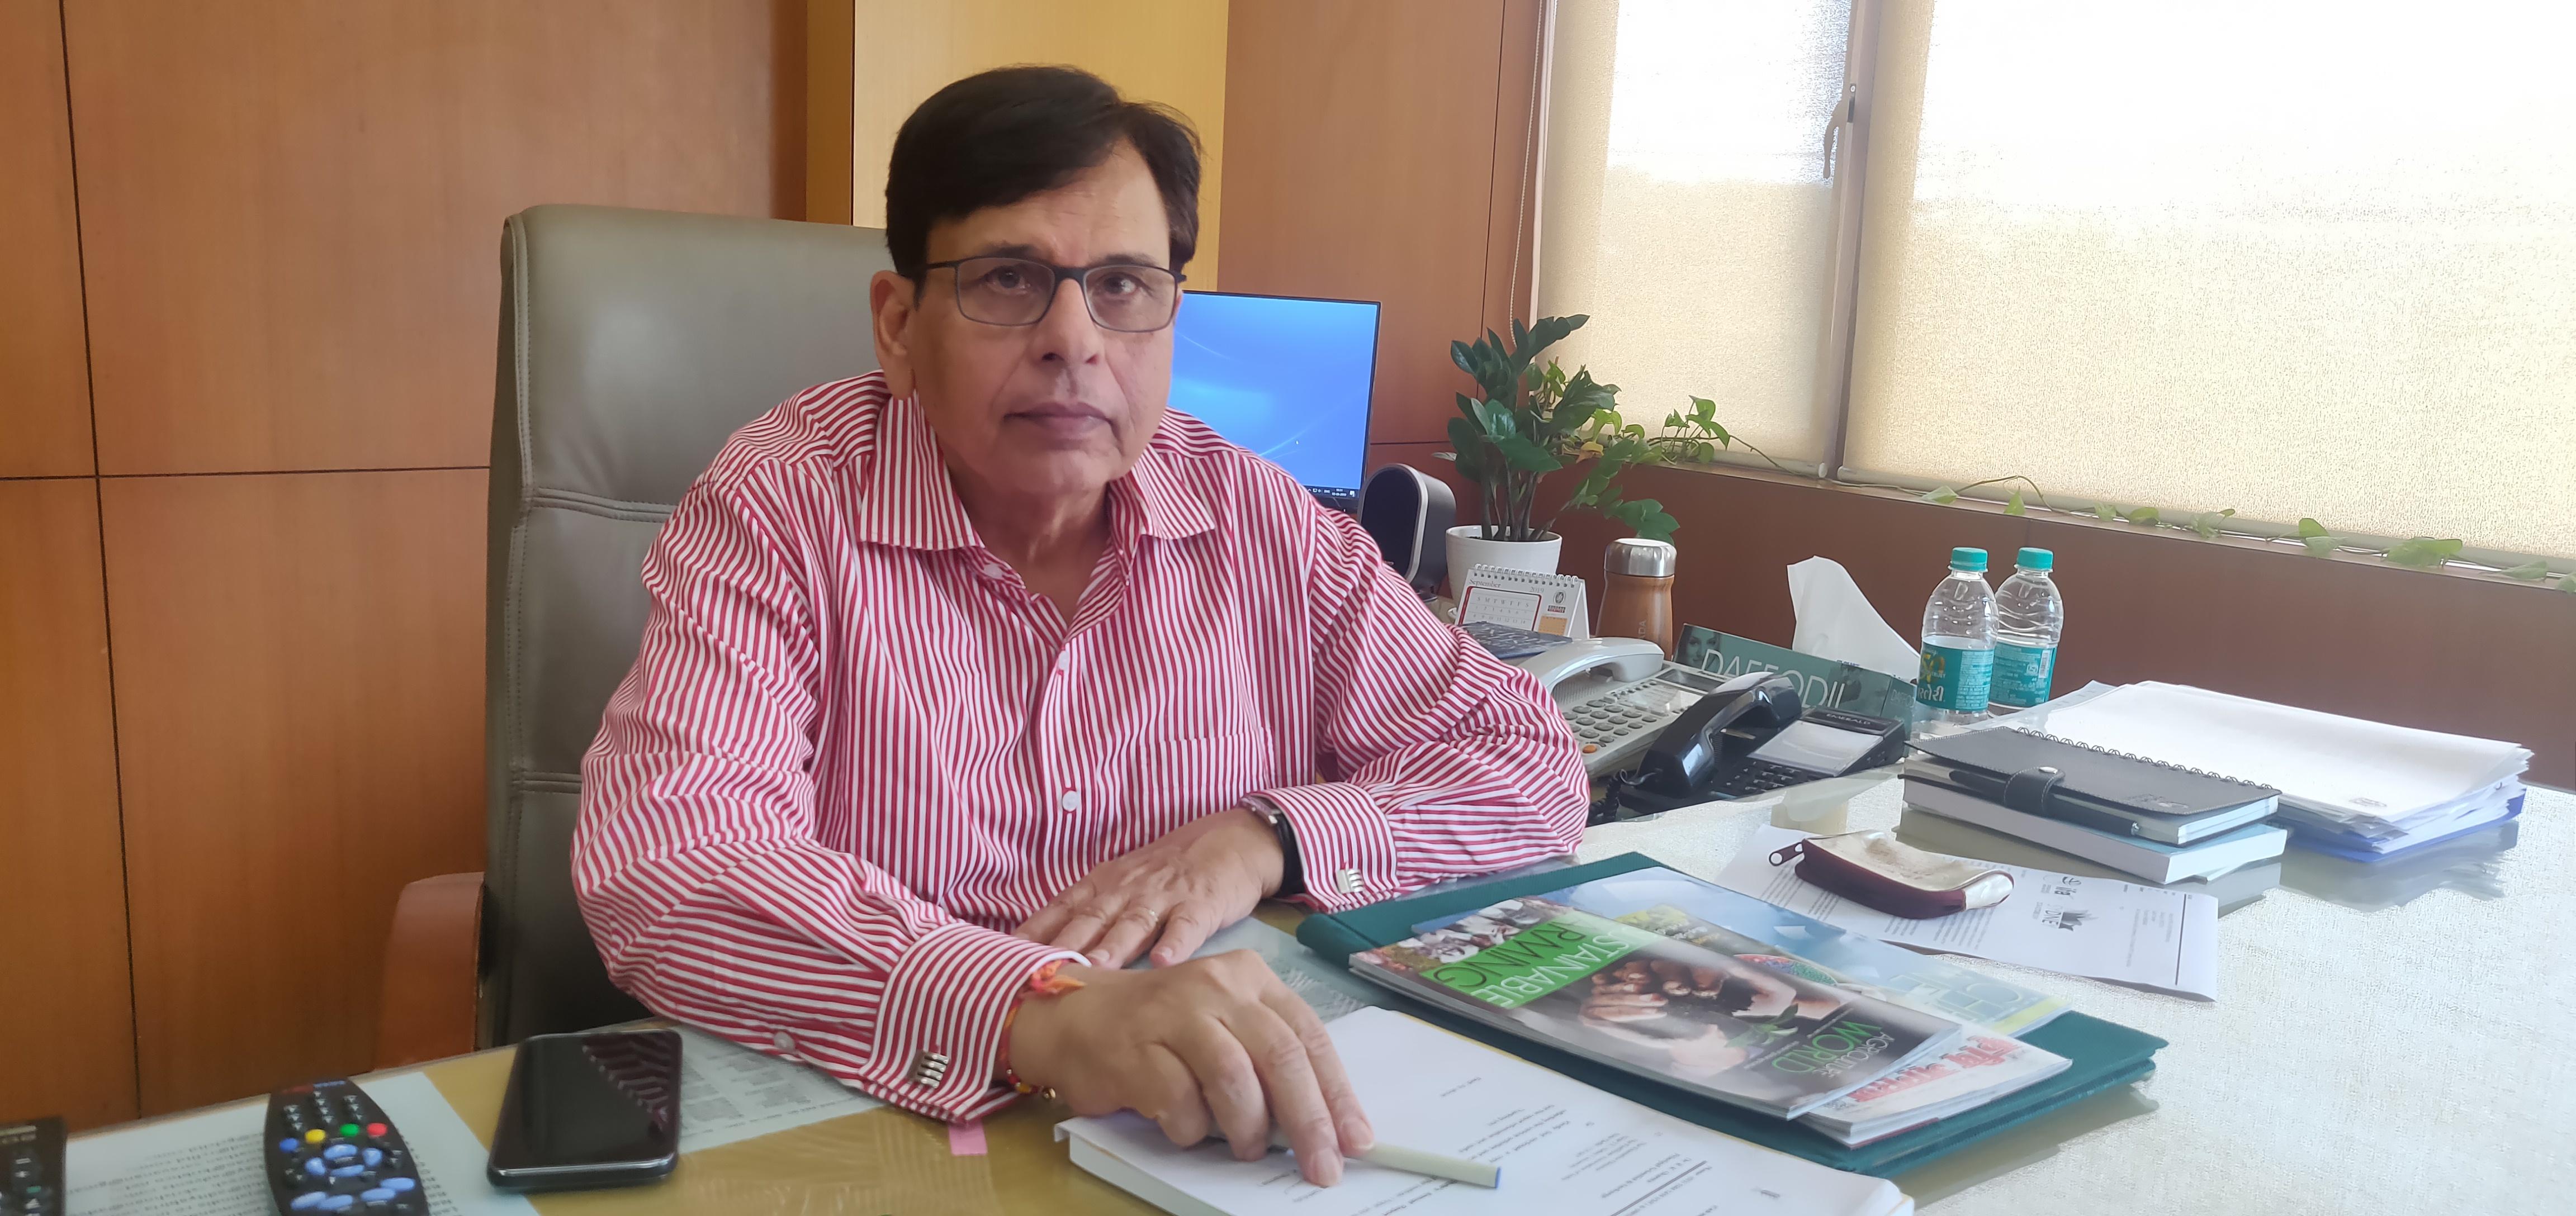 FAI Director General Explains